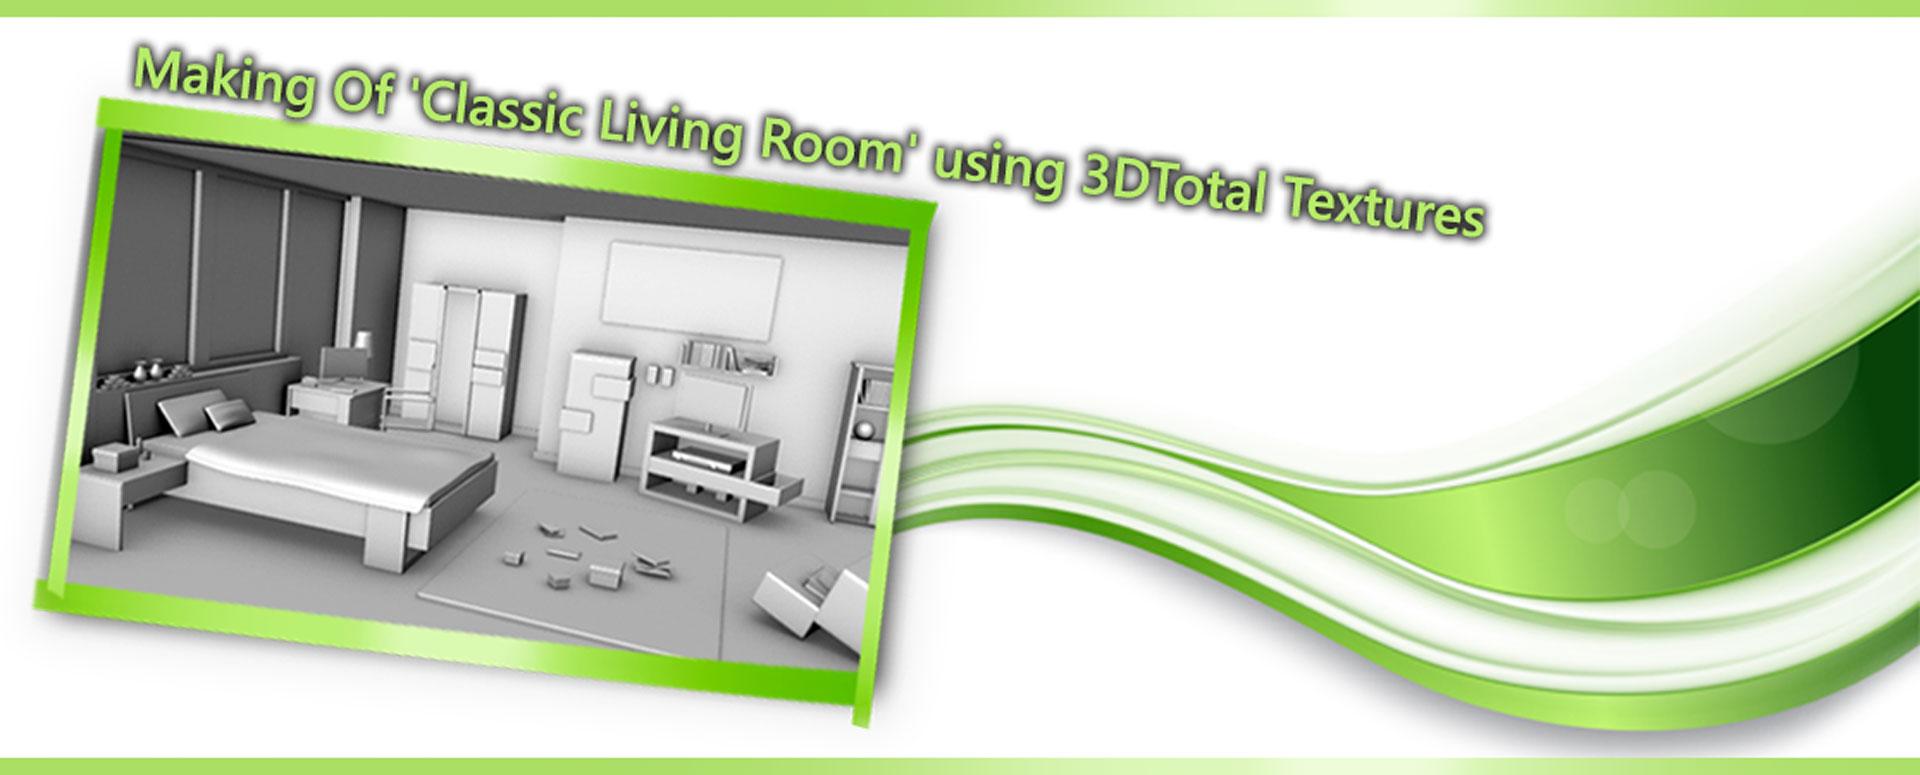 Making Classic Living Room using 3D 1 - مدلسازی اتاق خواب در تری دی مکس